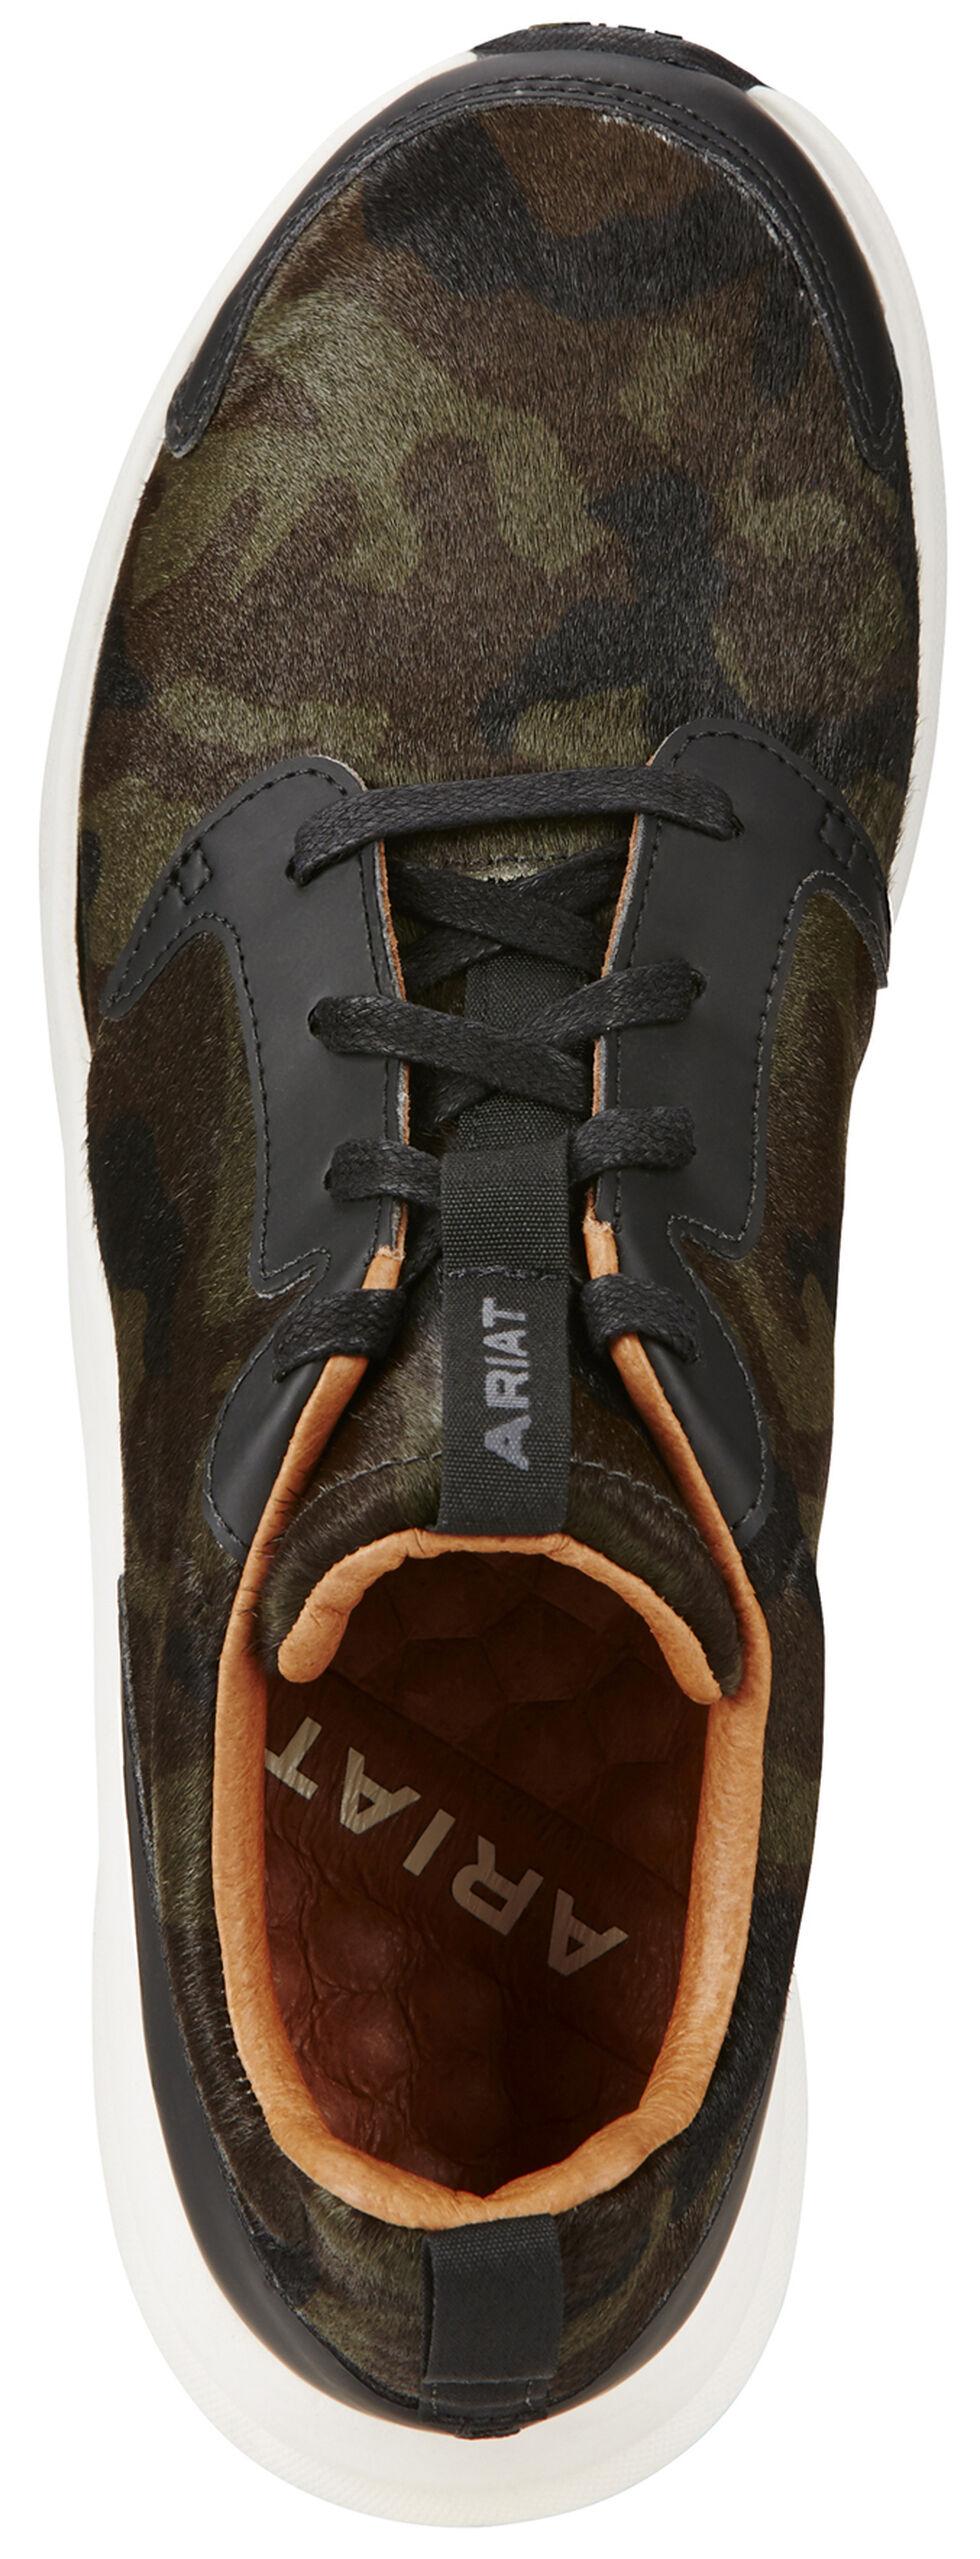 Ariat Women's Camo Suede Fusion Athletic Shoes, , hi-res